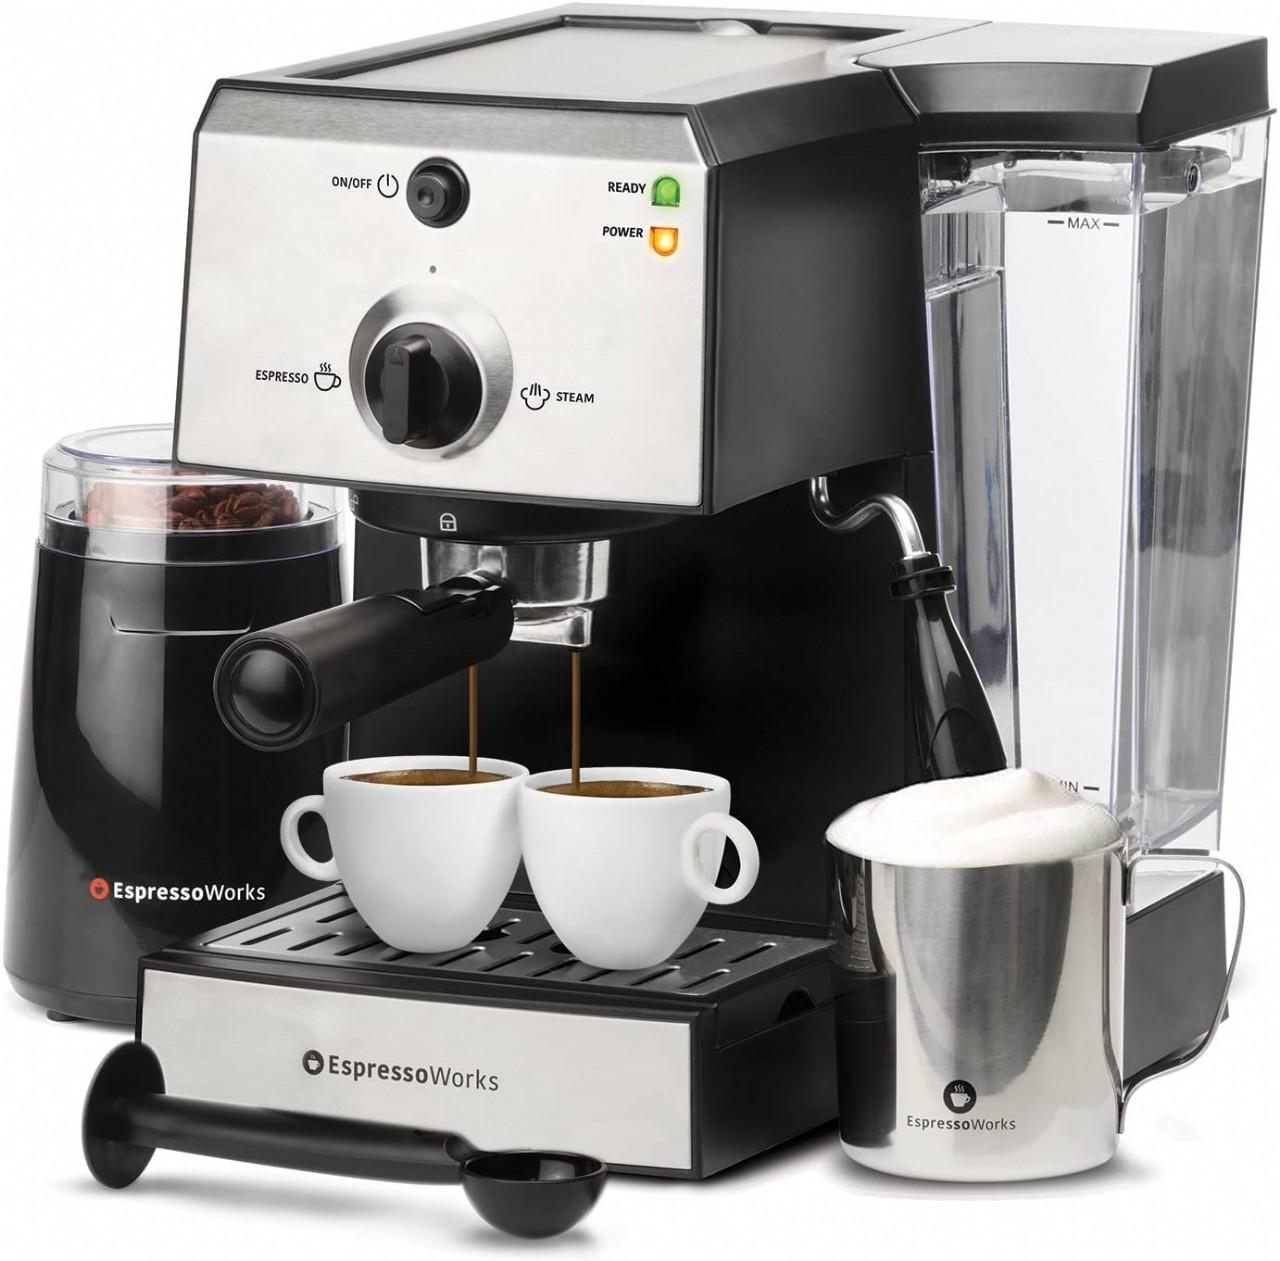 EspressoWorks 7 Pc All-In-One Espresso Machine & Cappuccino Maker Barista Bundle Set w/ Built-In